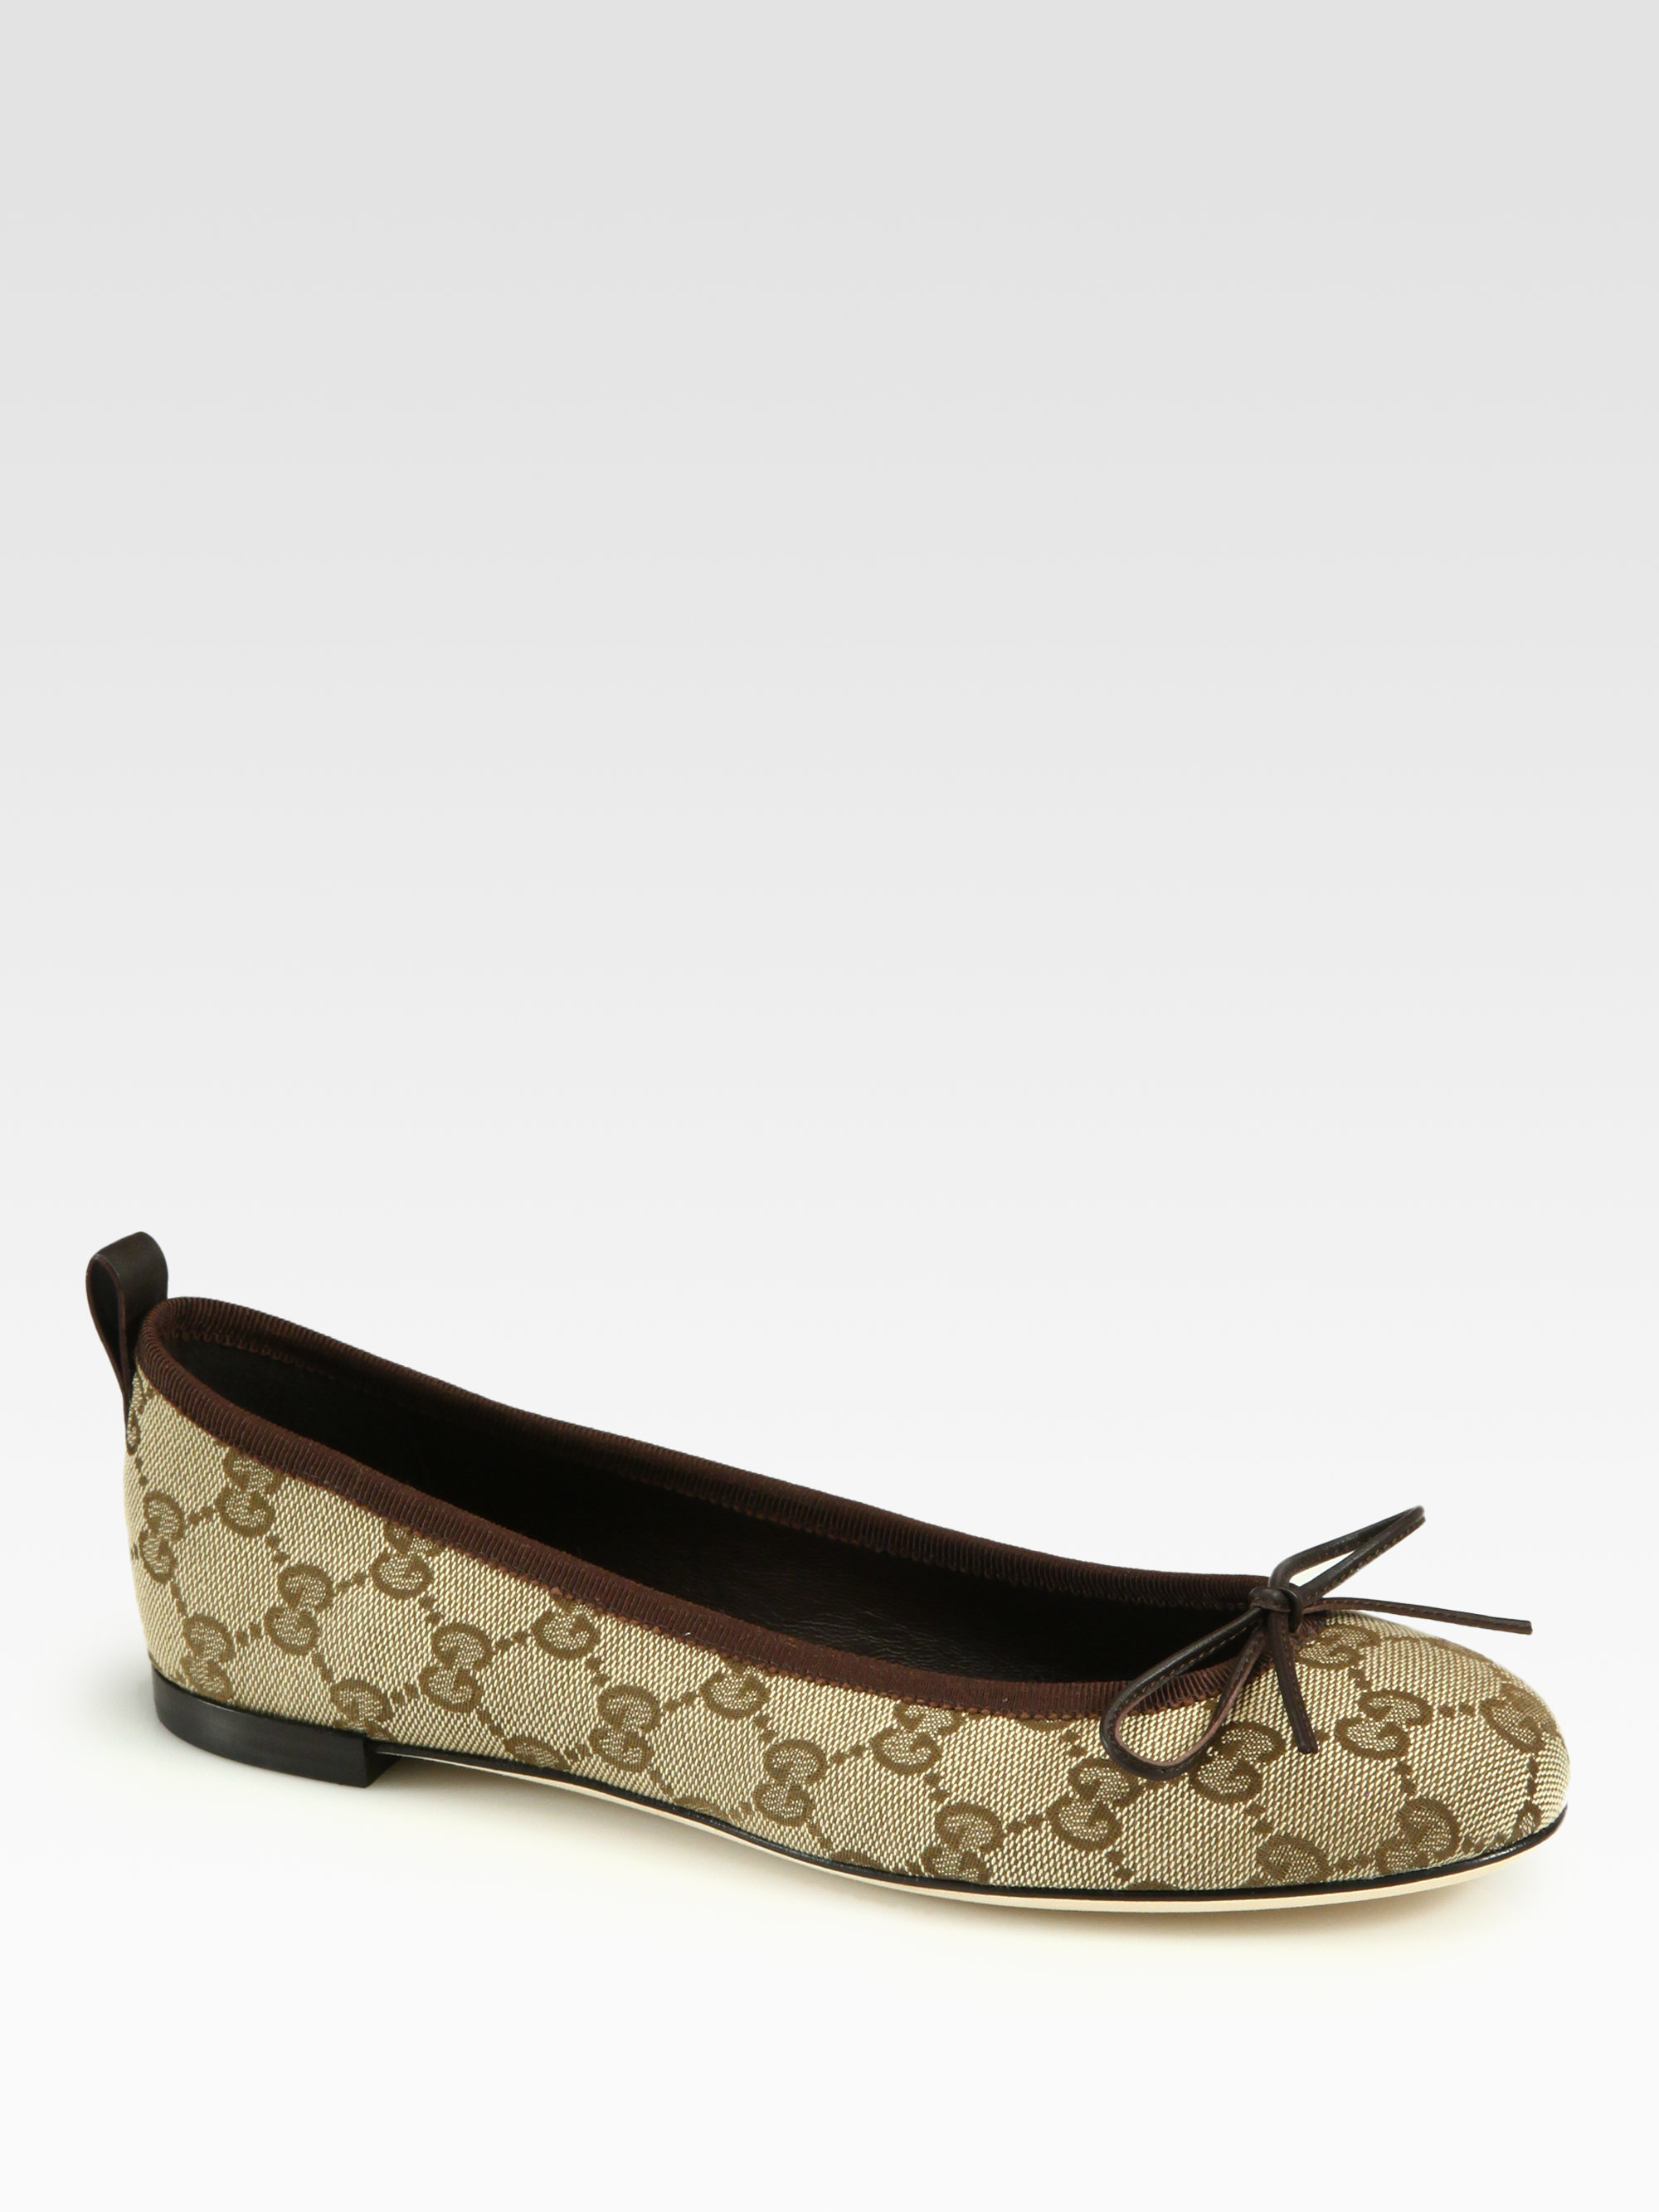 Gucci Ali Canvas \u0026 Leather Ballet Flats